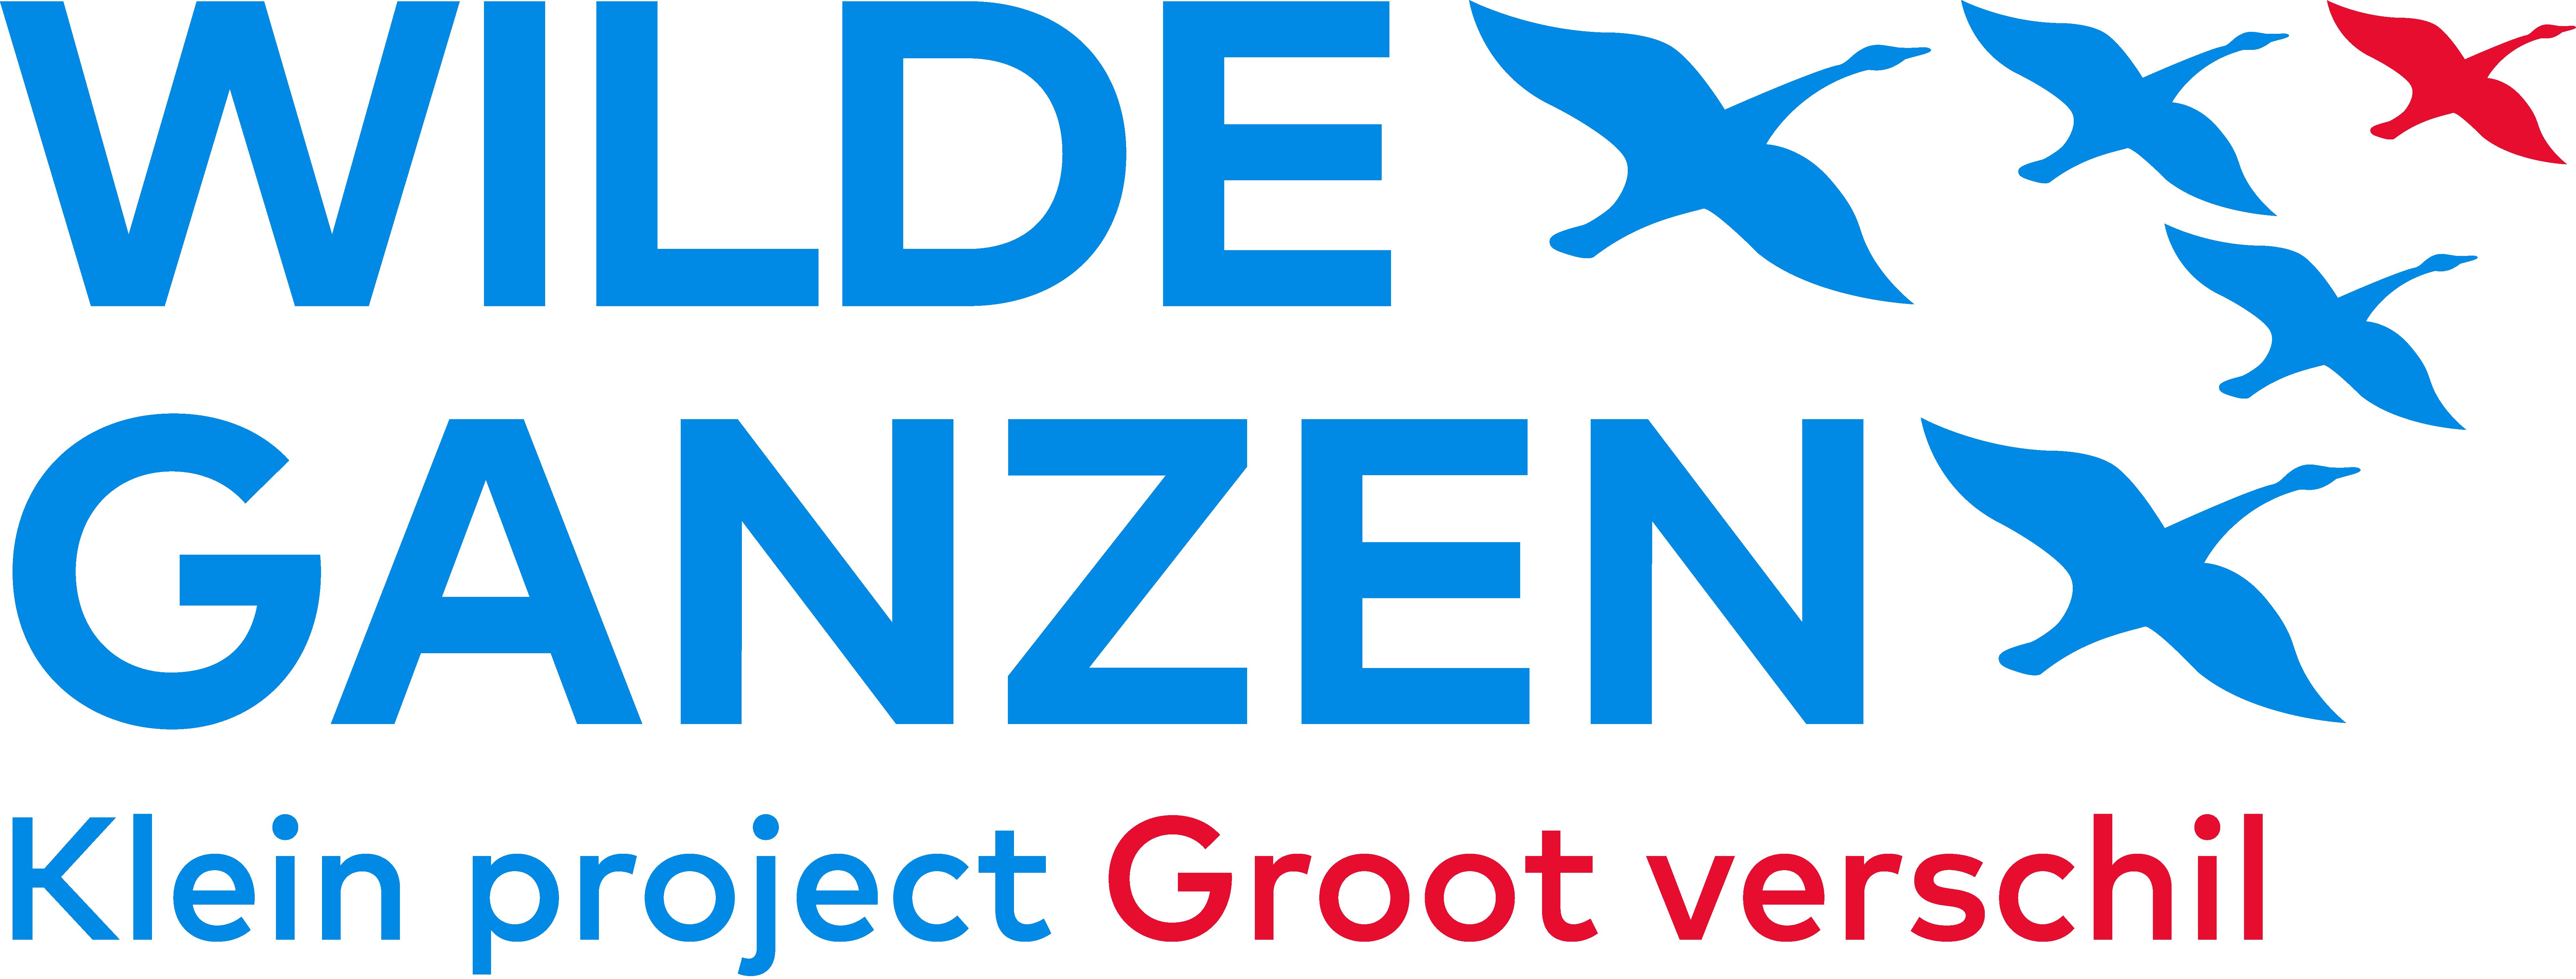 Wilde Ganzen Logo Pay-off compact RGB